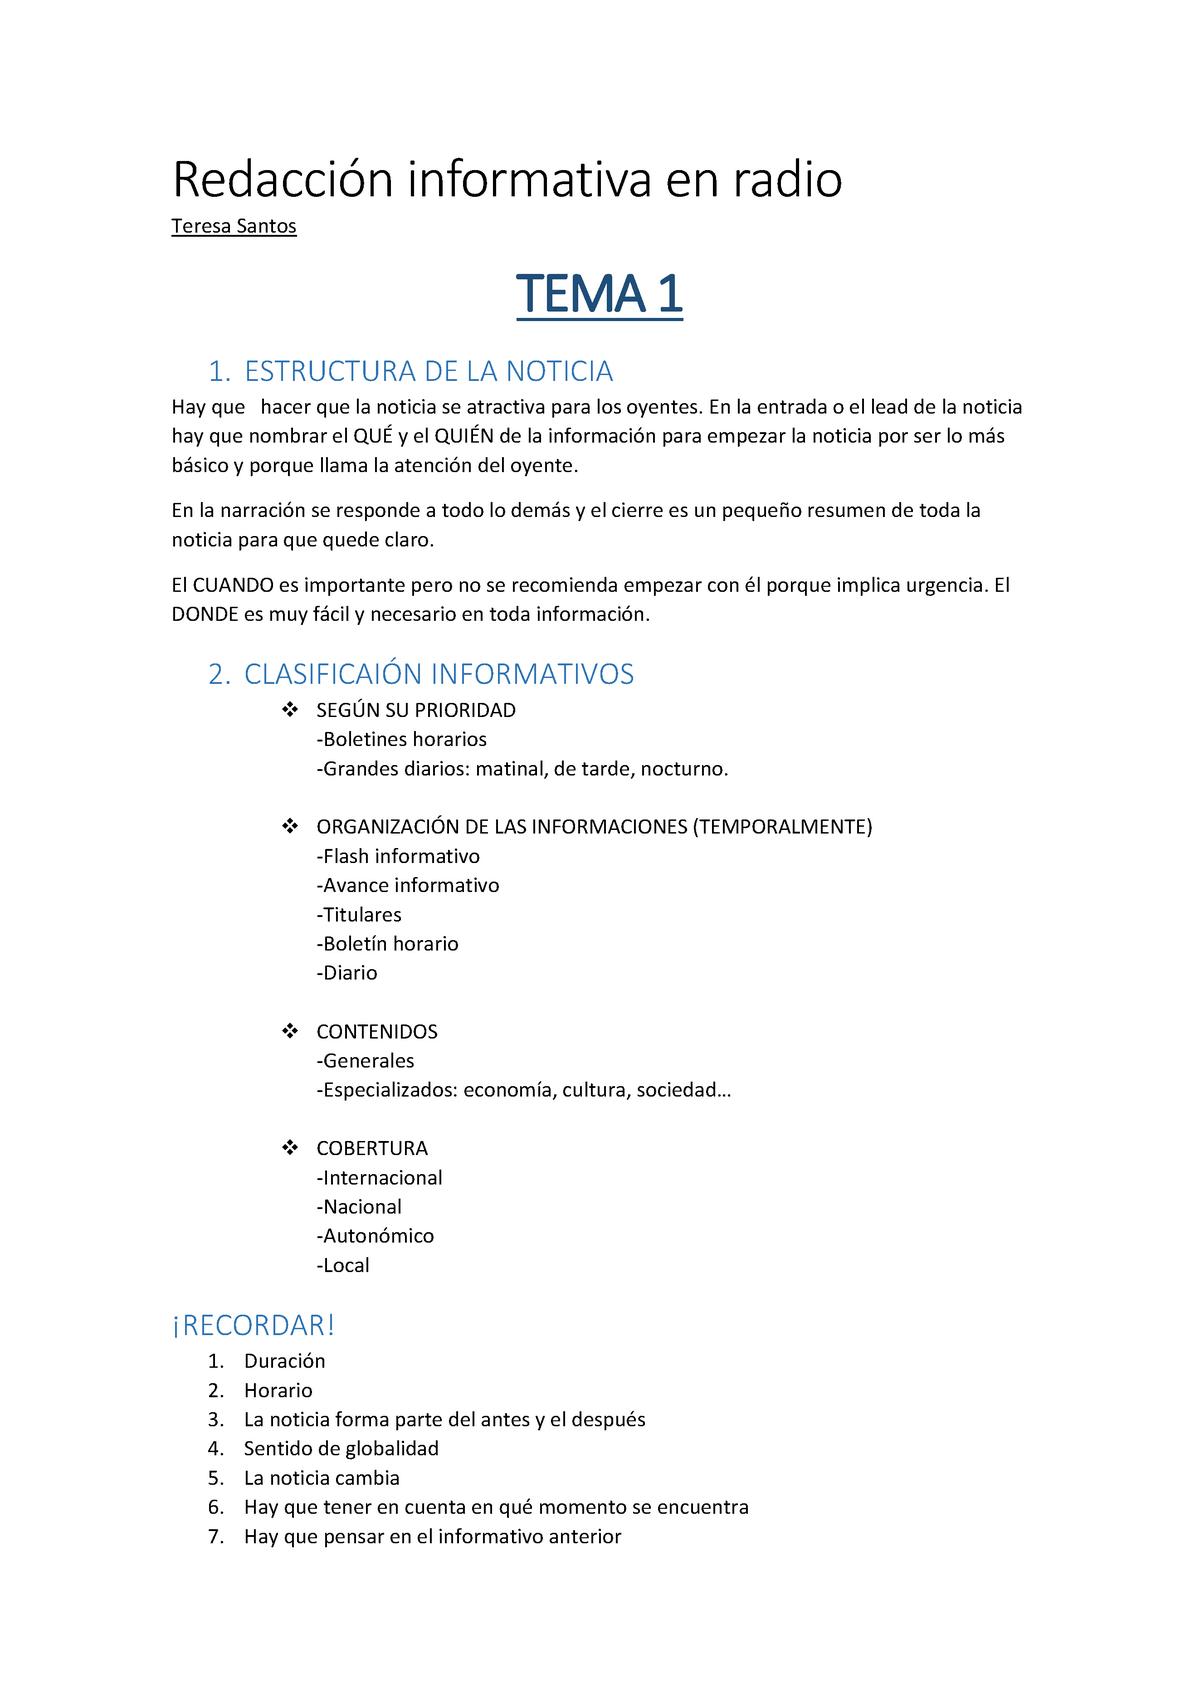 Apuntes Temas 1 5 Profesora Teresa Santos Upv Studocu